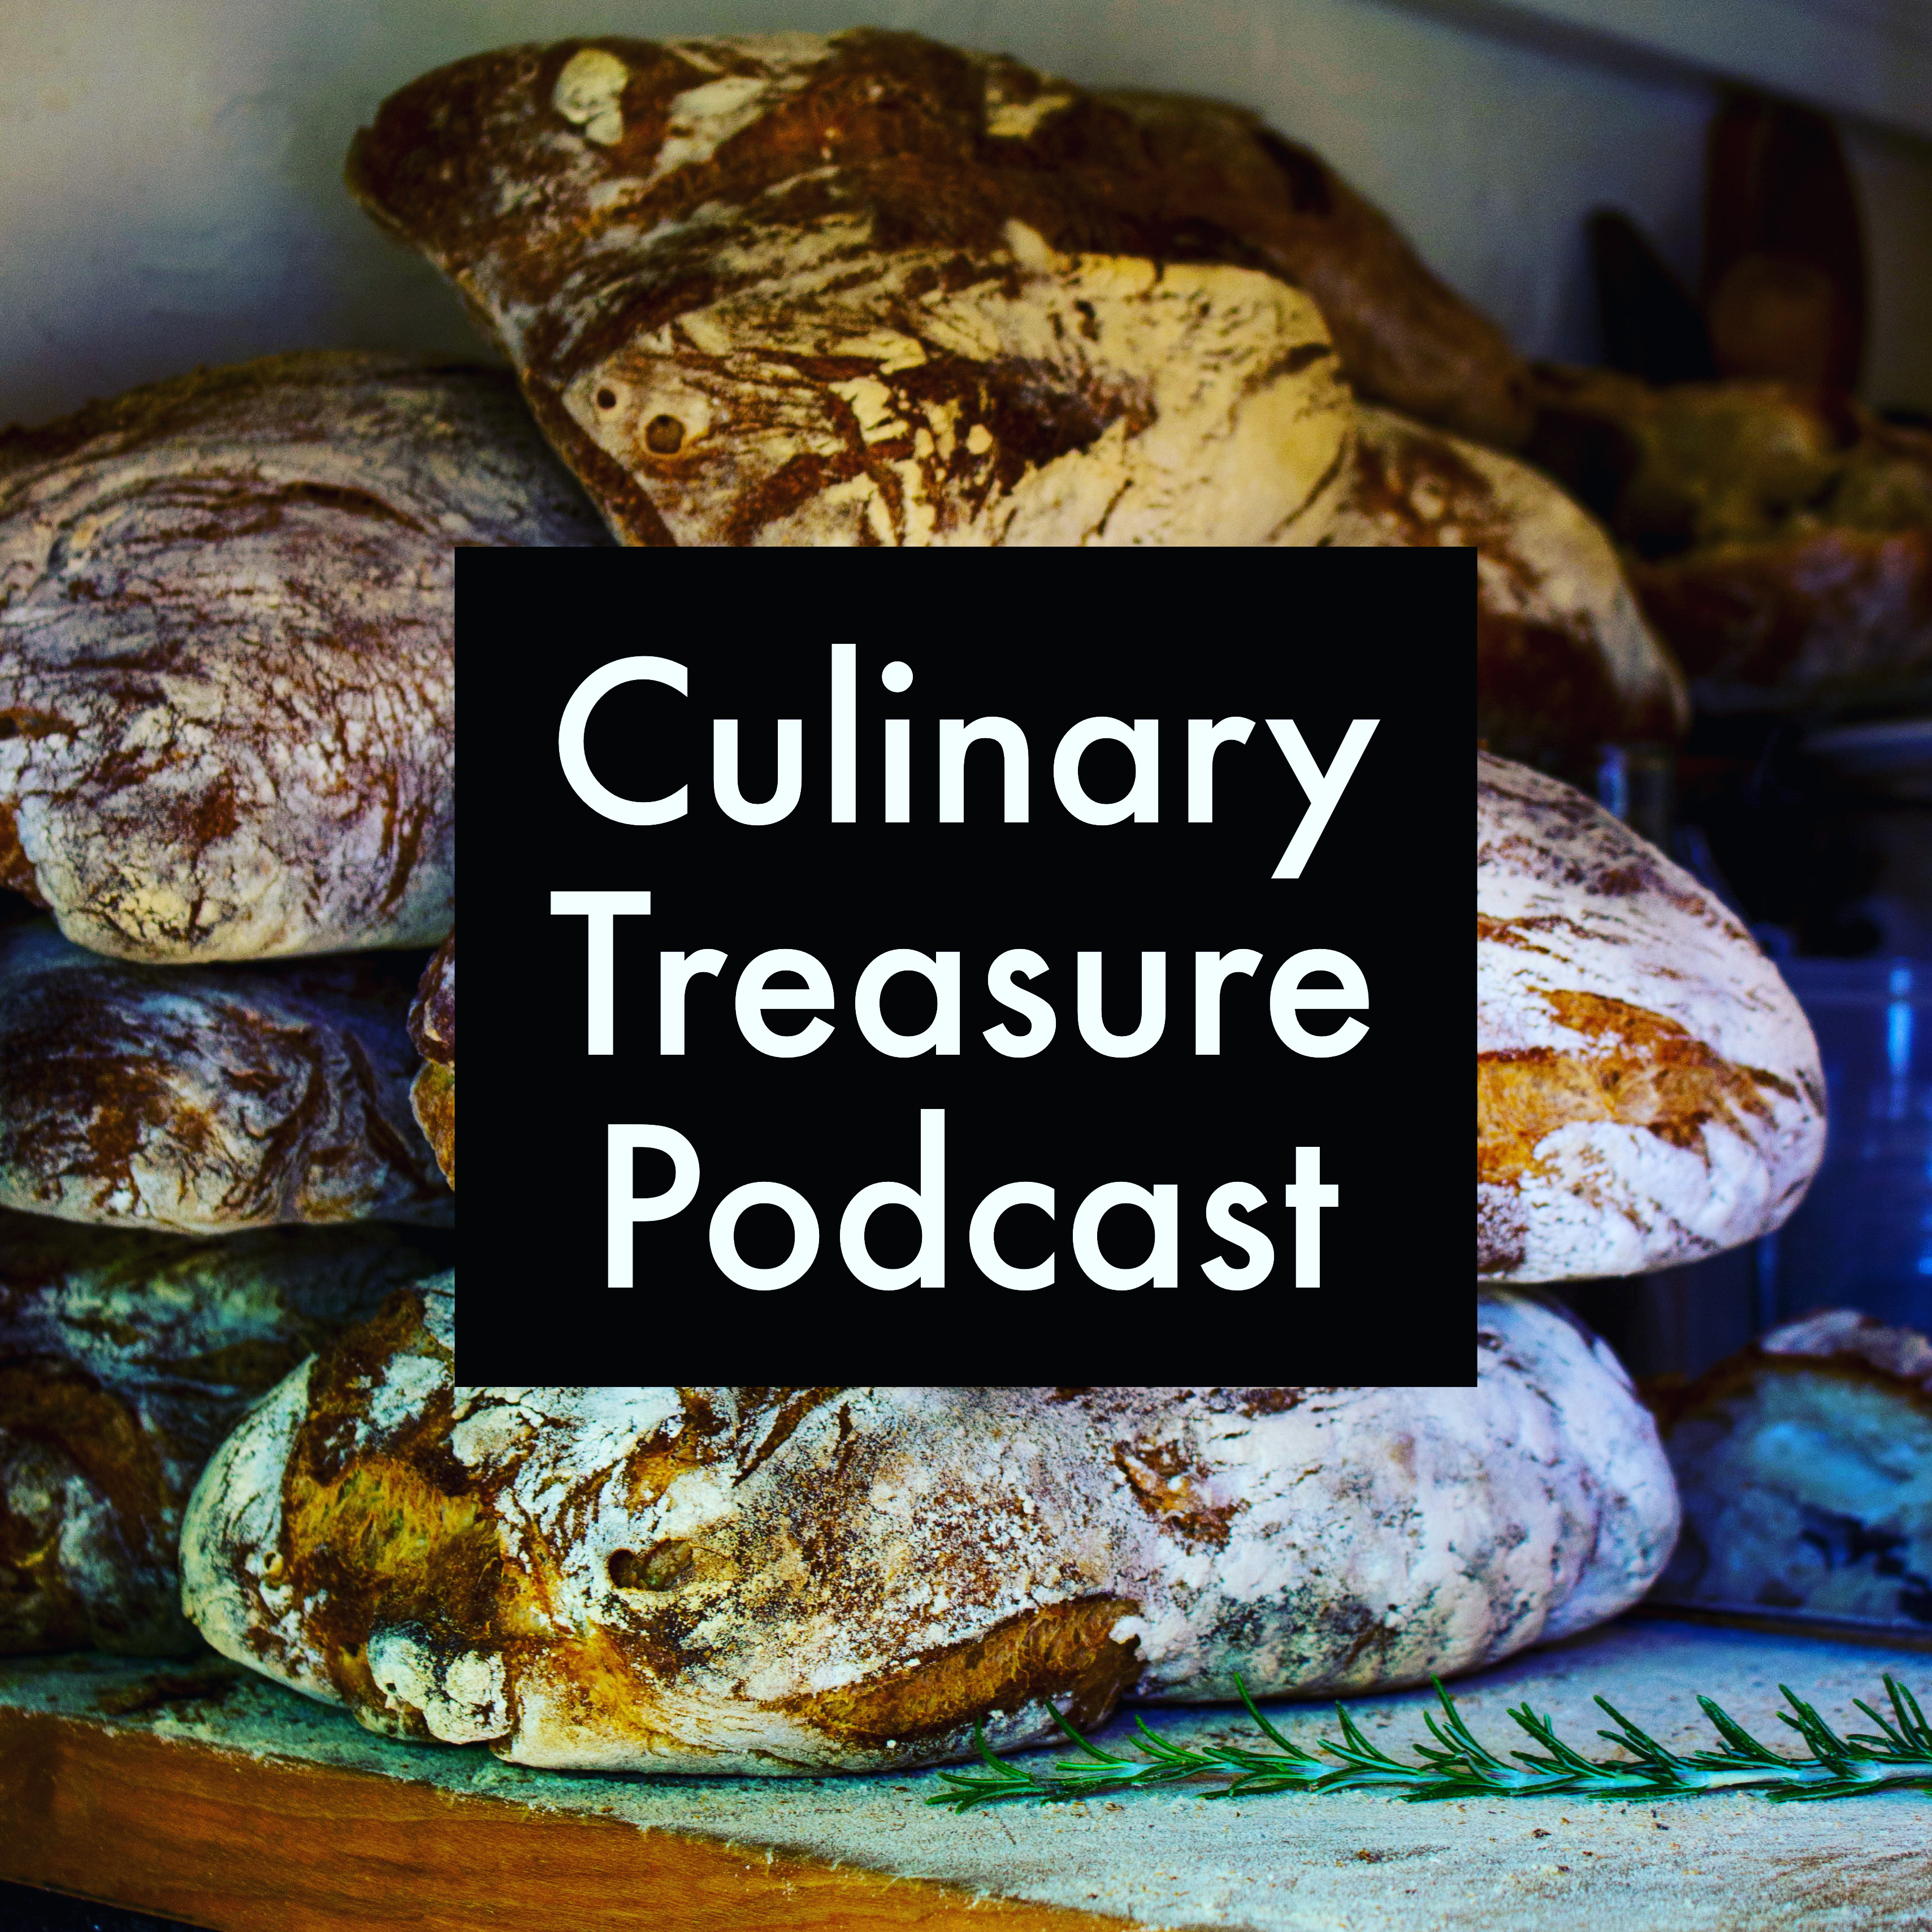 Culinary Treasure Podcast show art